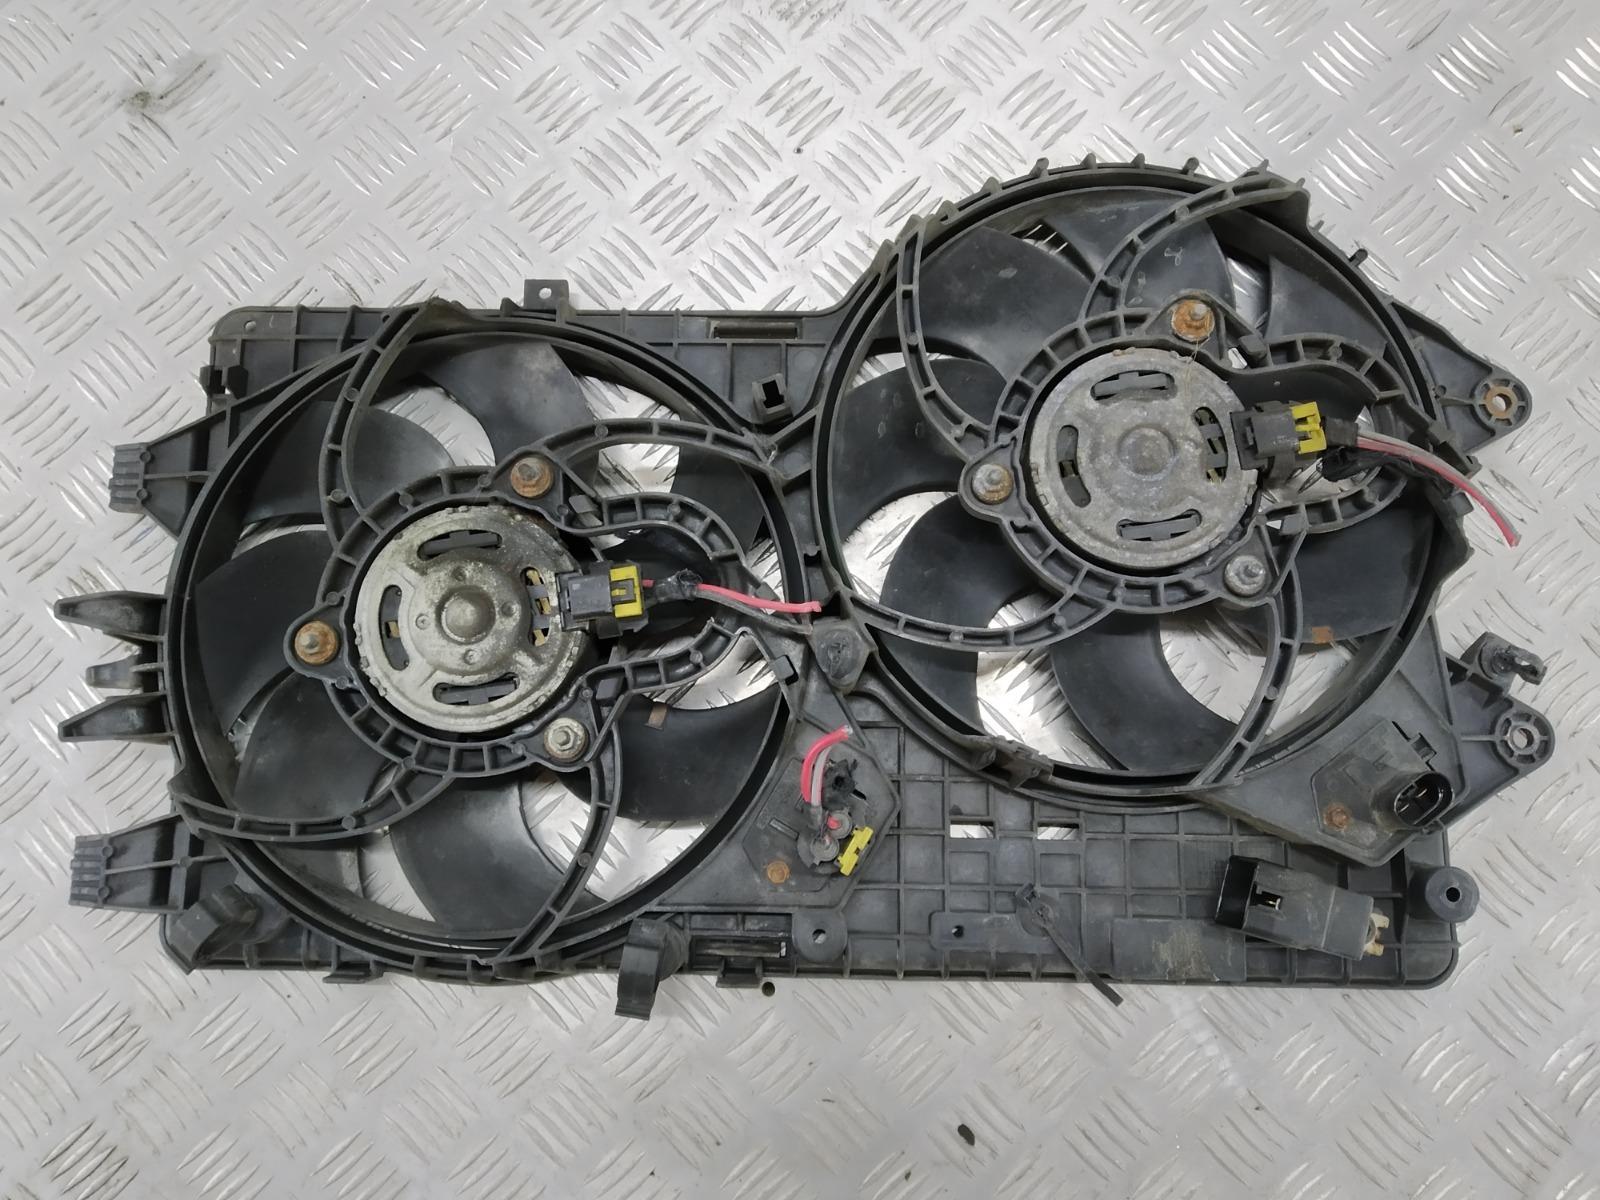 Вентилятор радиатора Fiat Punto 1.9 JTD 2006 (б/у)